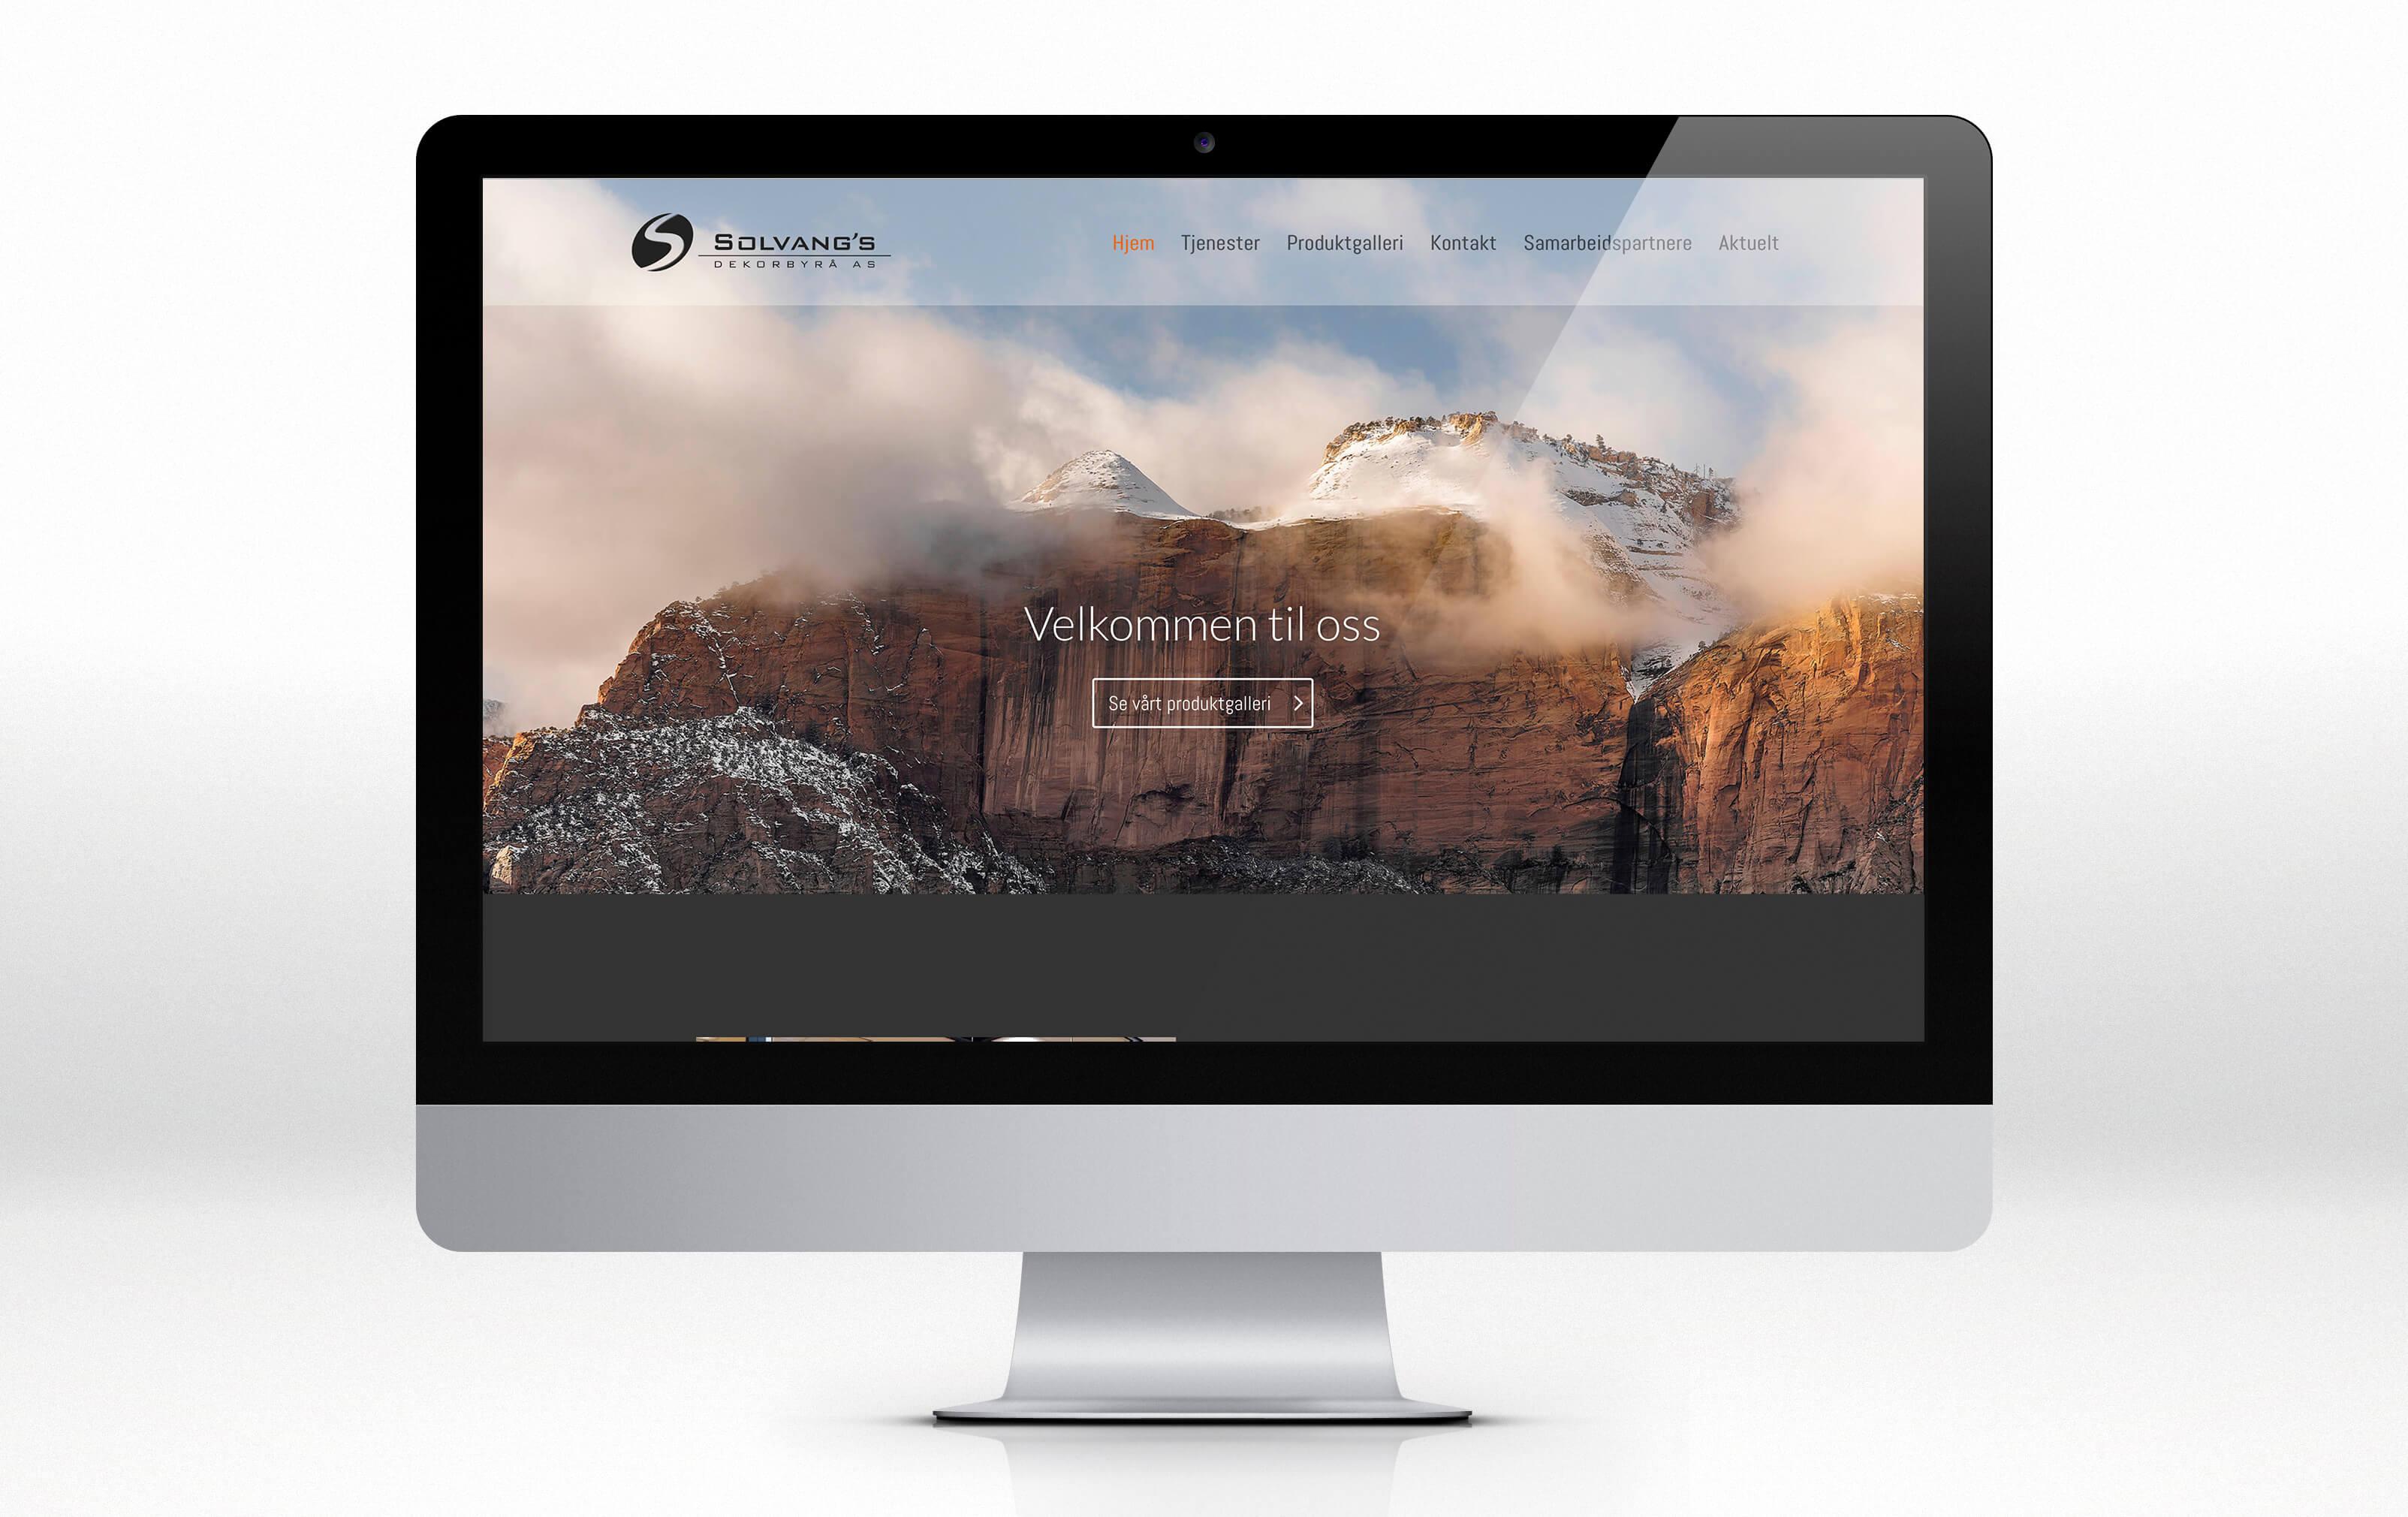 solvangs.no-website-mac-image